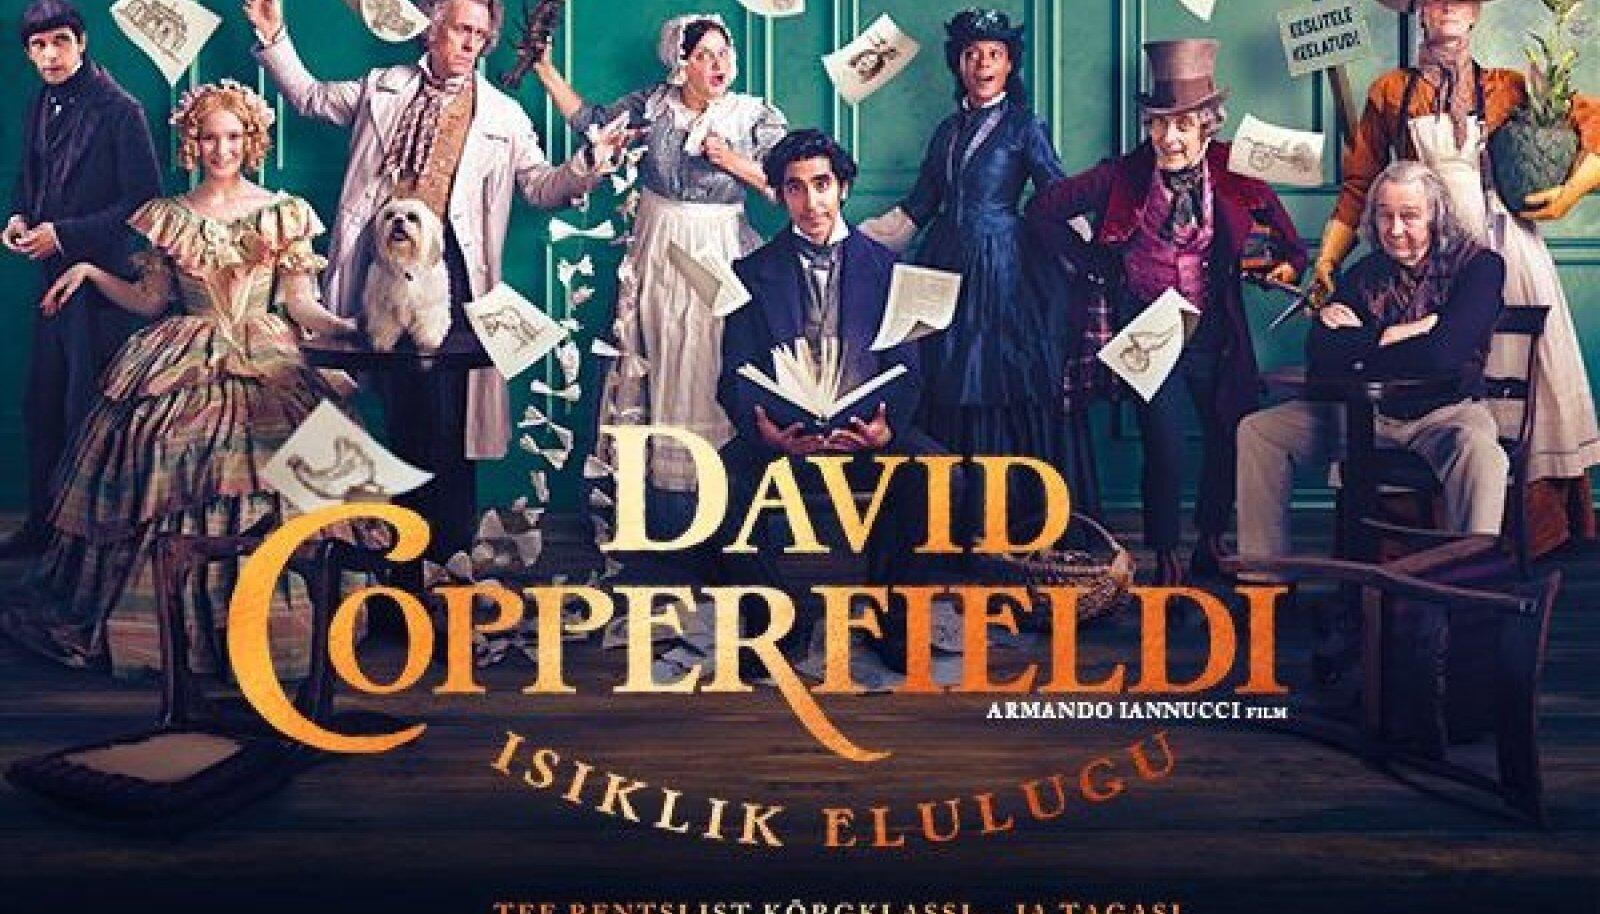 """David Copperfieldi isiklik elulugu"""